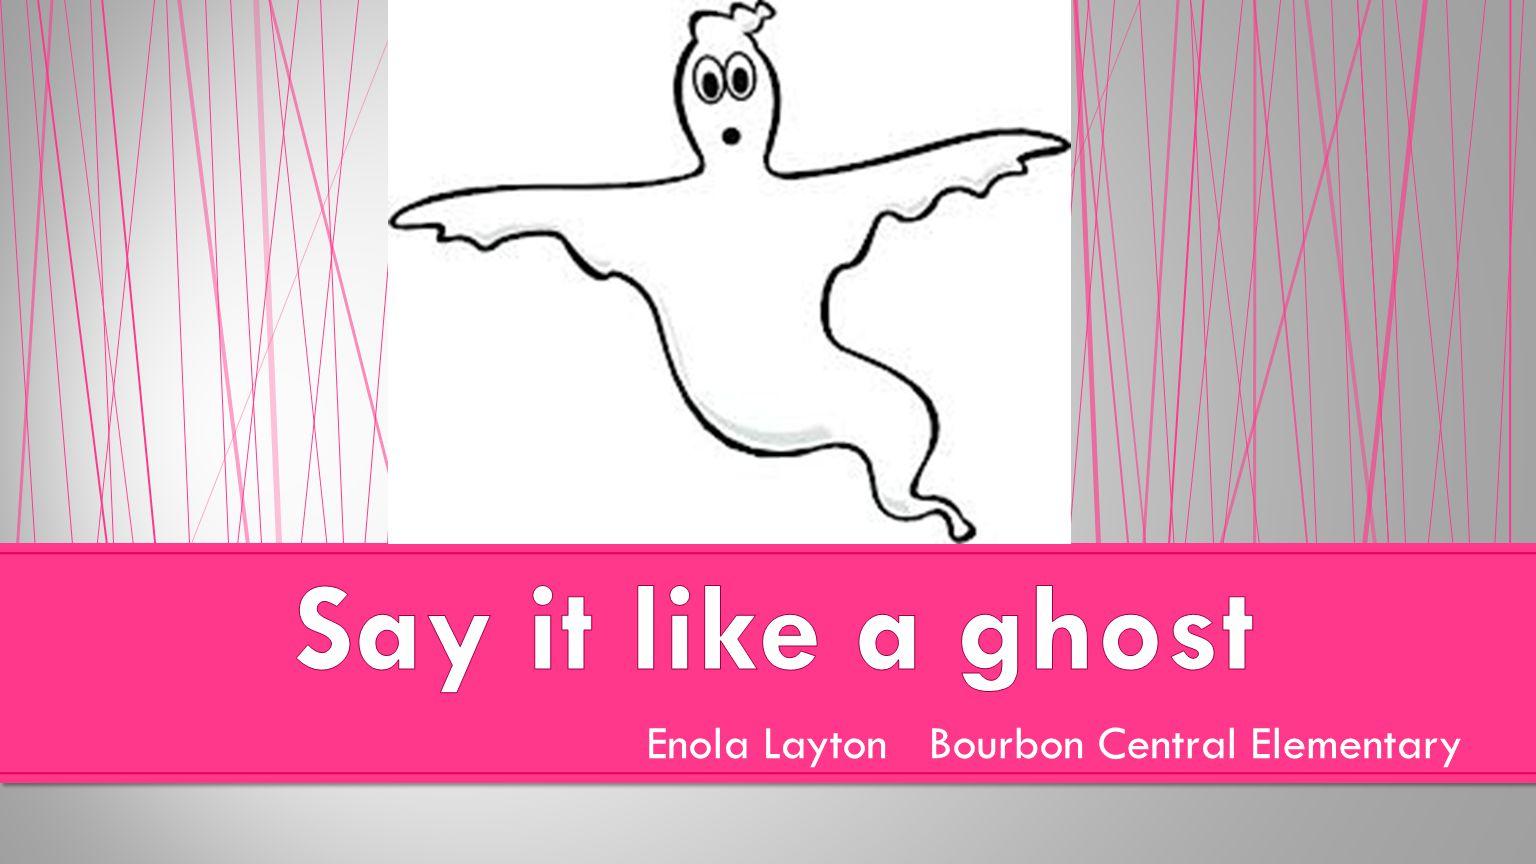 Enola Layton Bourbon Central Elementary